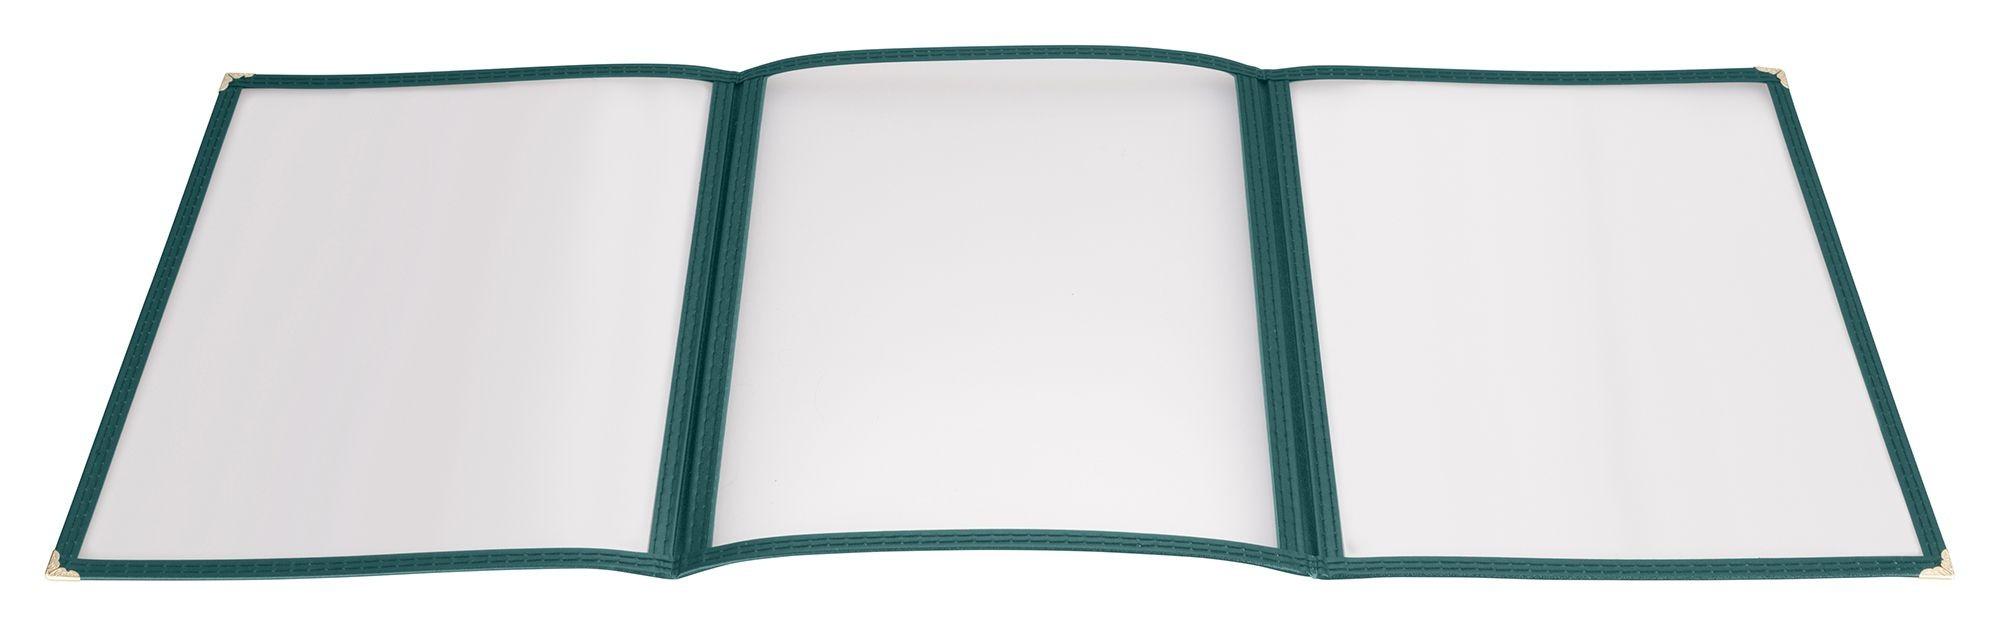 "Winco PMCT-9G Green Triple Fold Menu Cover 9-1/2"" x 12"""